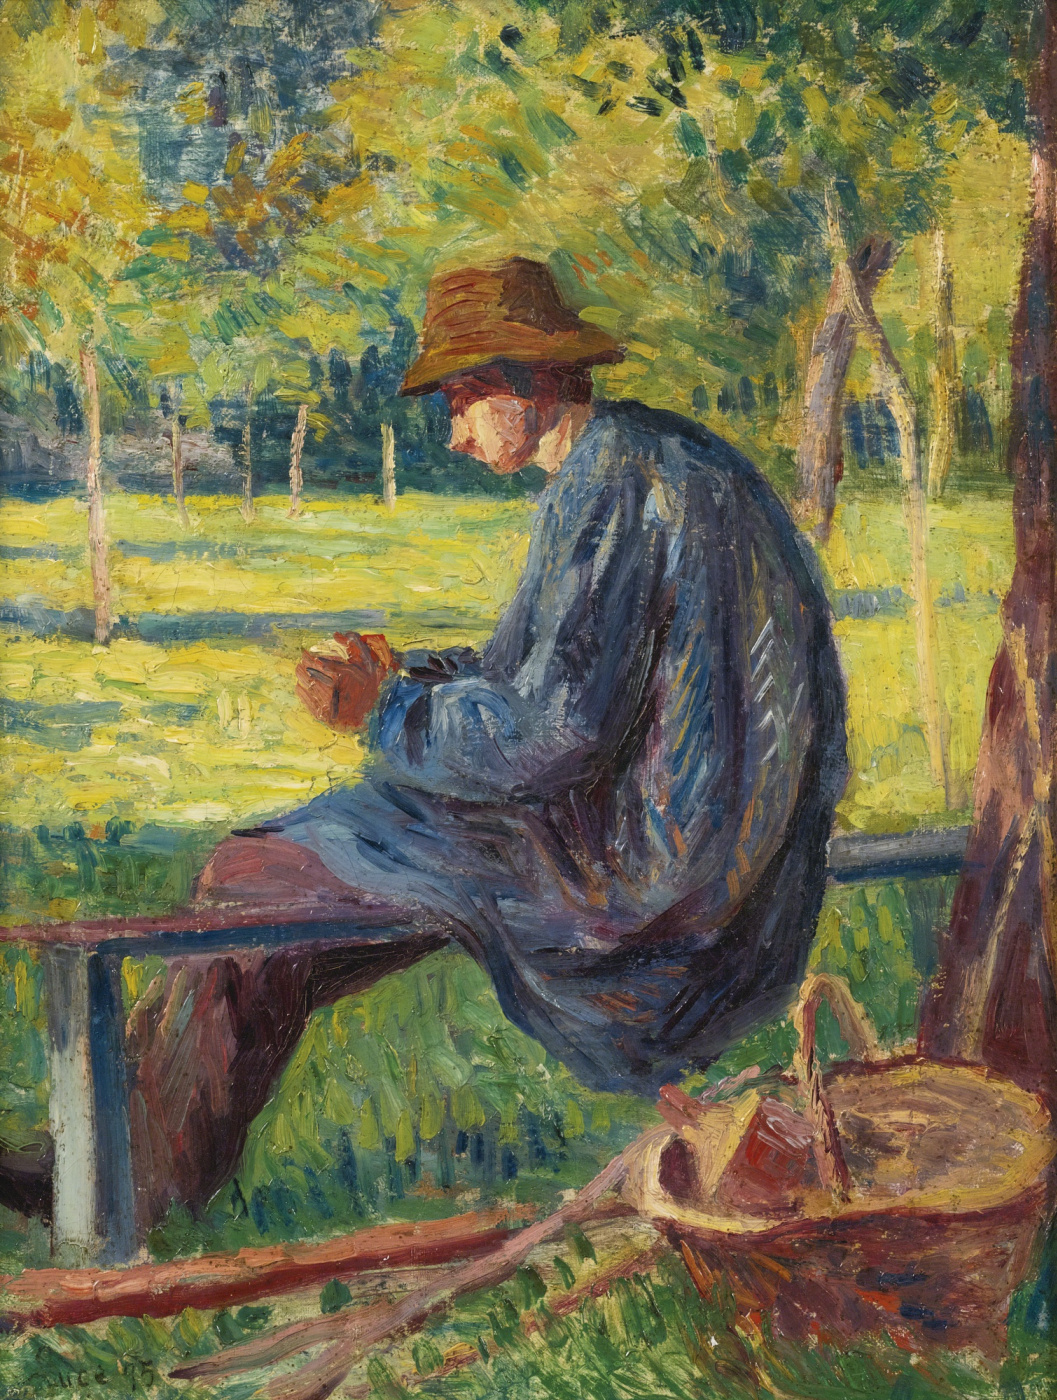 Maximilian Luce. Louis-Rudolph Pissarro in his father's garden